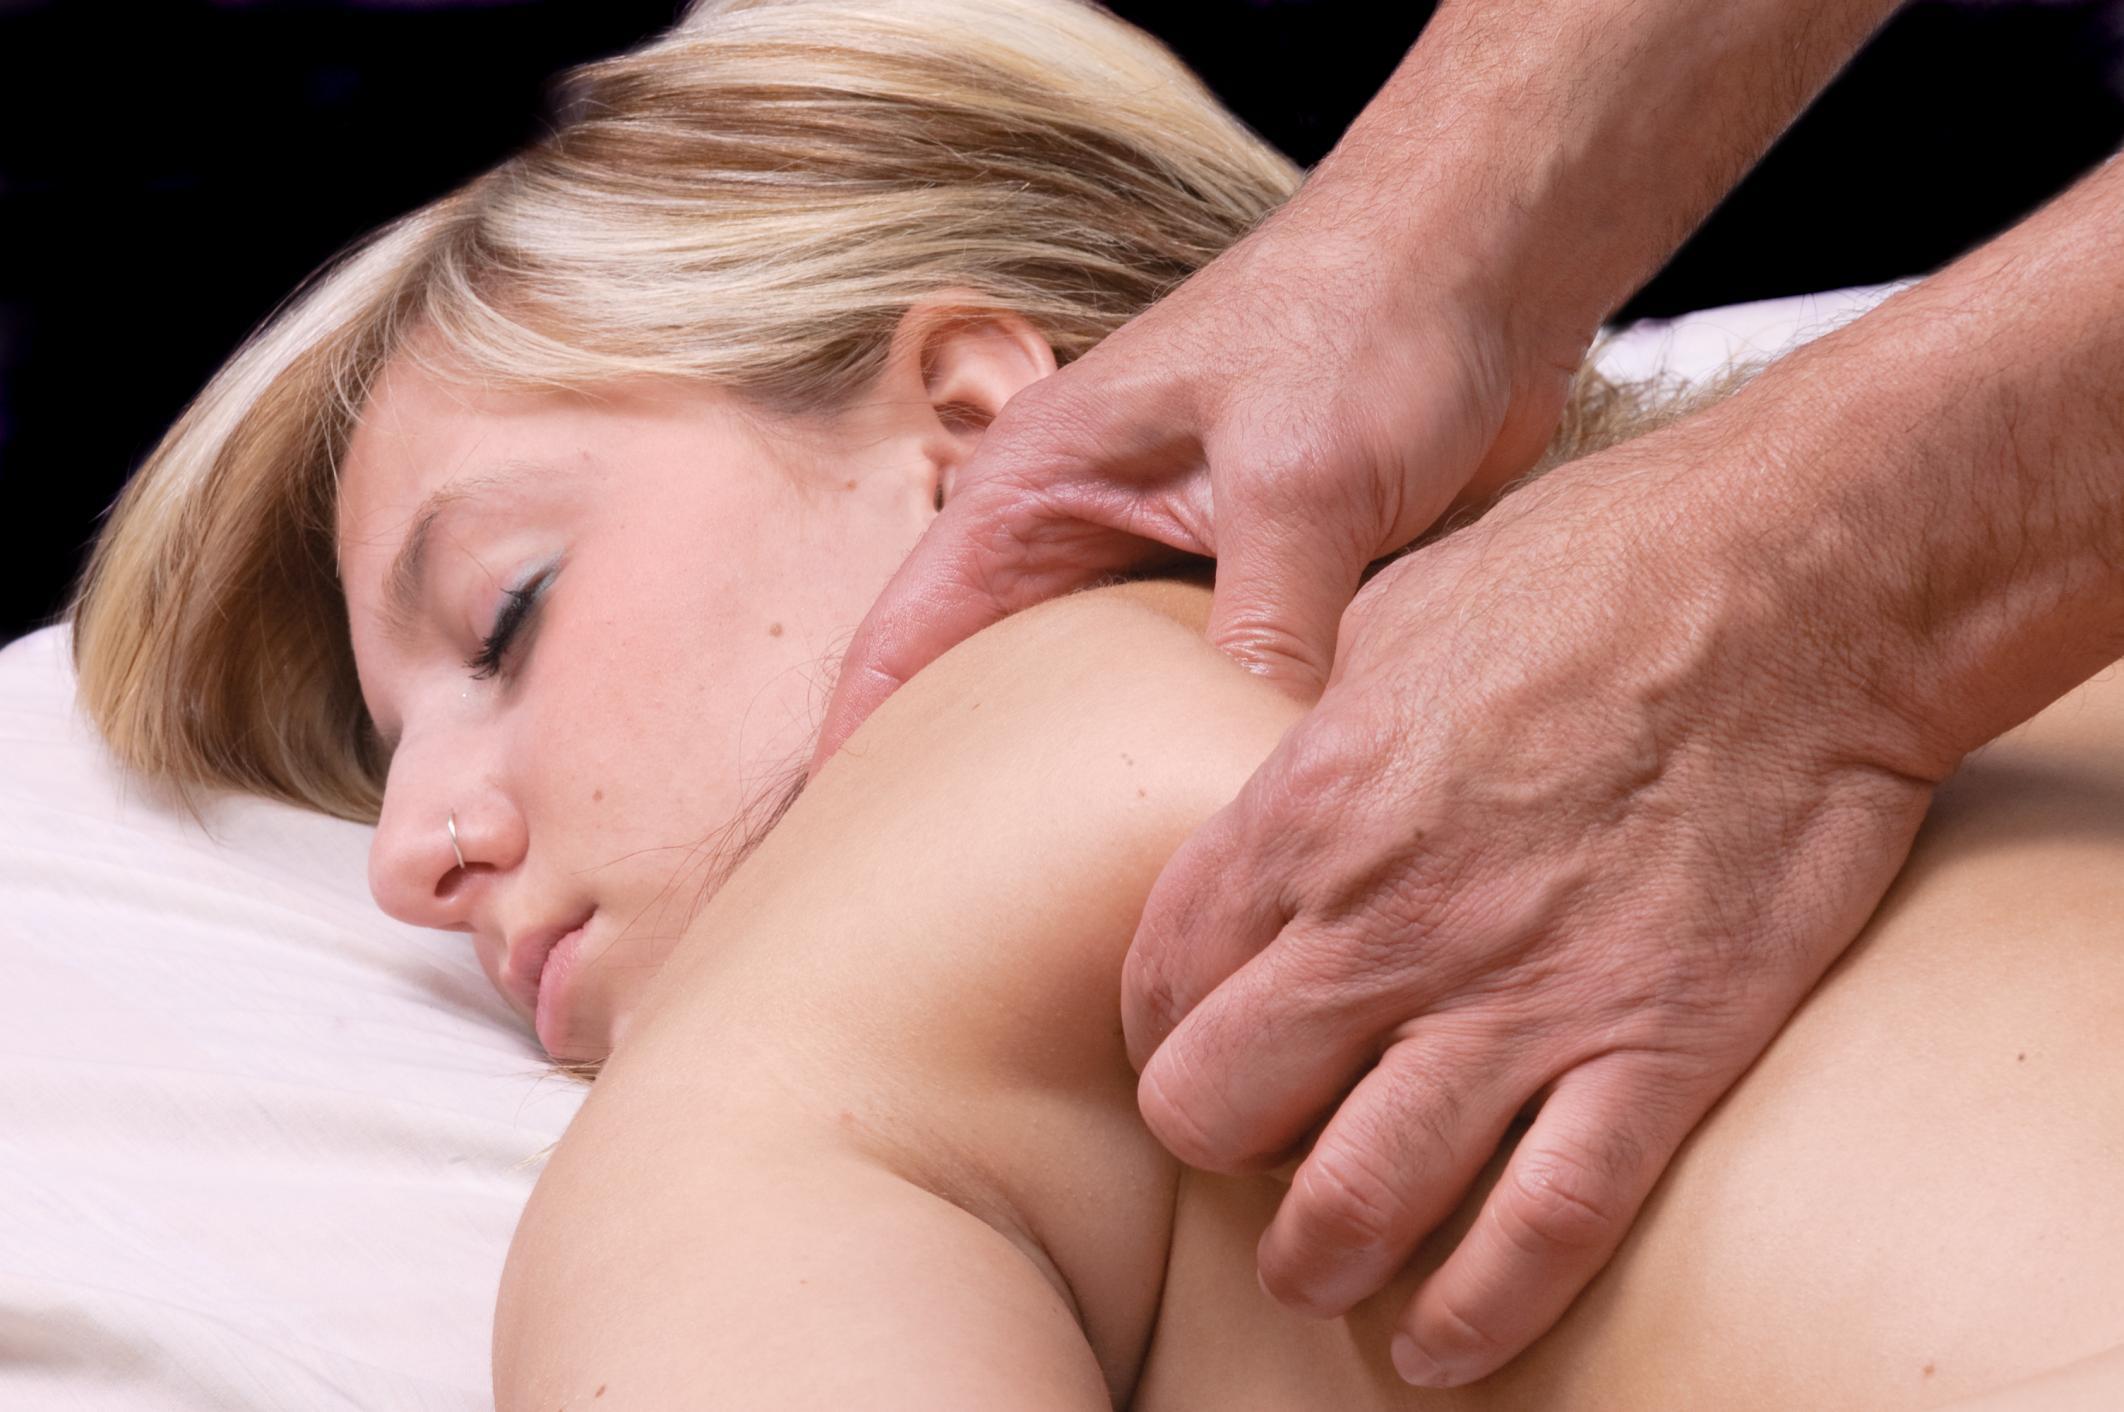 Massage therapist massaging a woman's shoulder